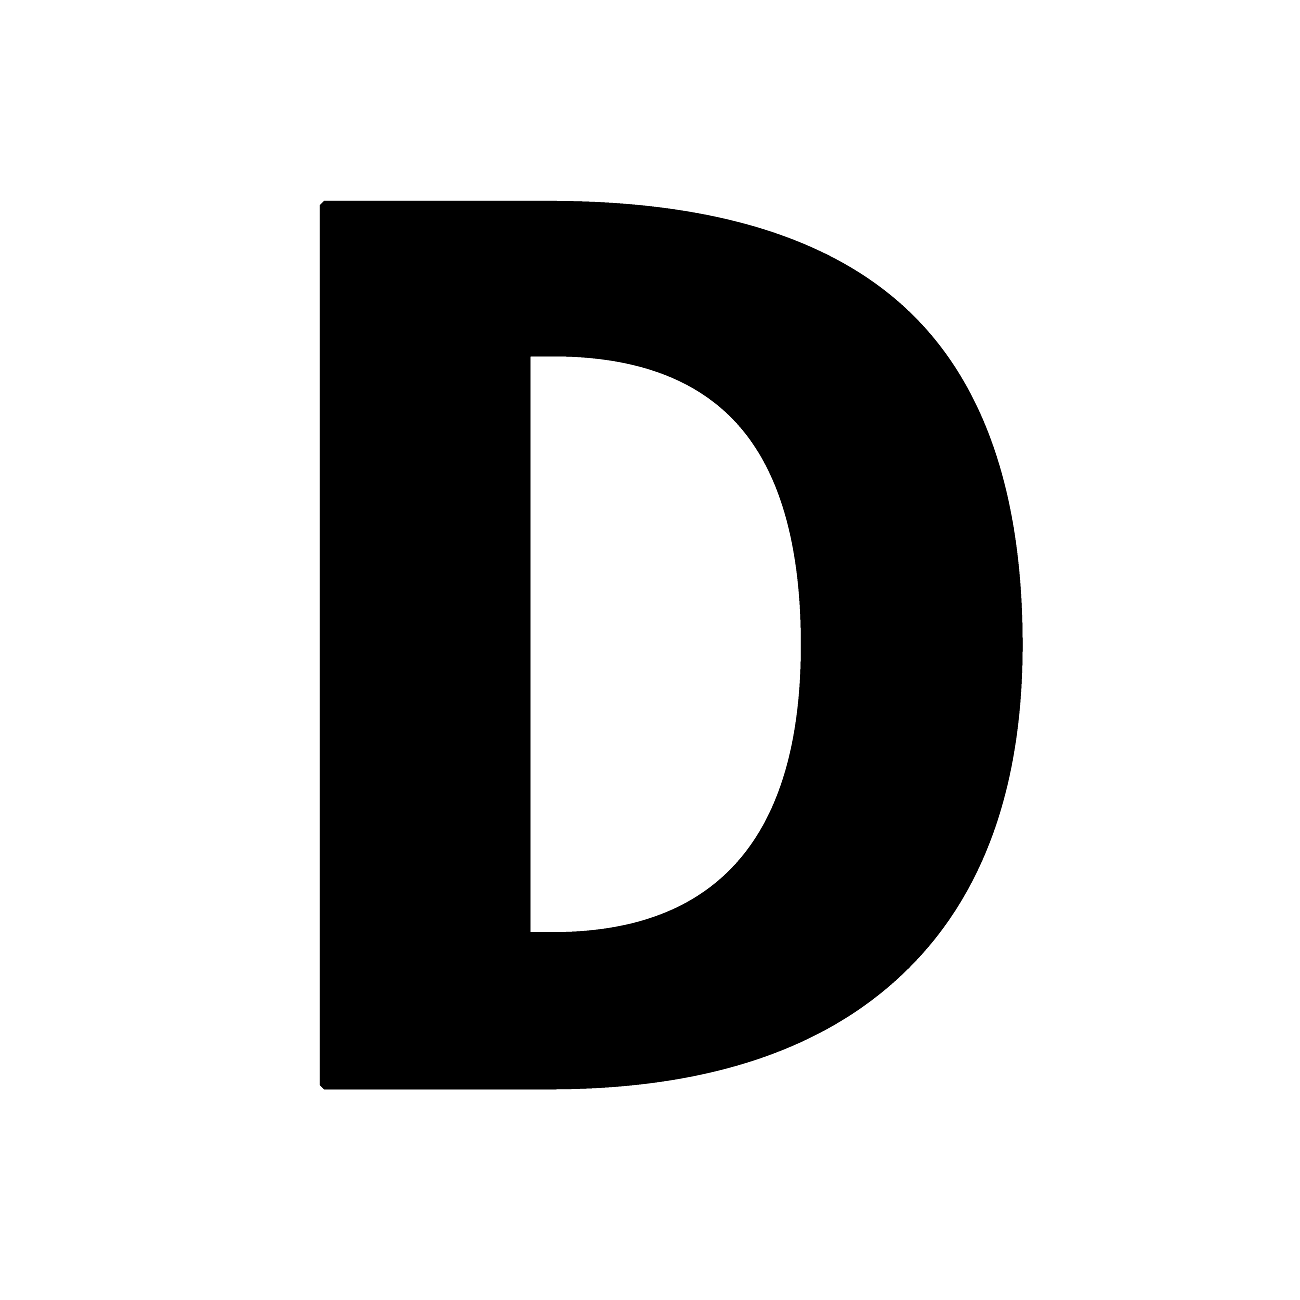 D&g ベルト 偽物 見分け方 グッチ | グッチベルト 白